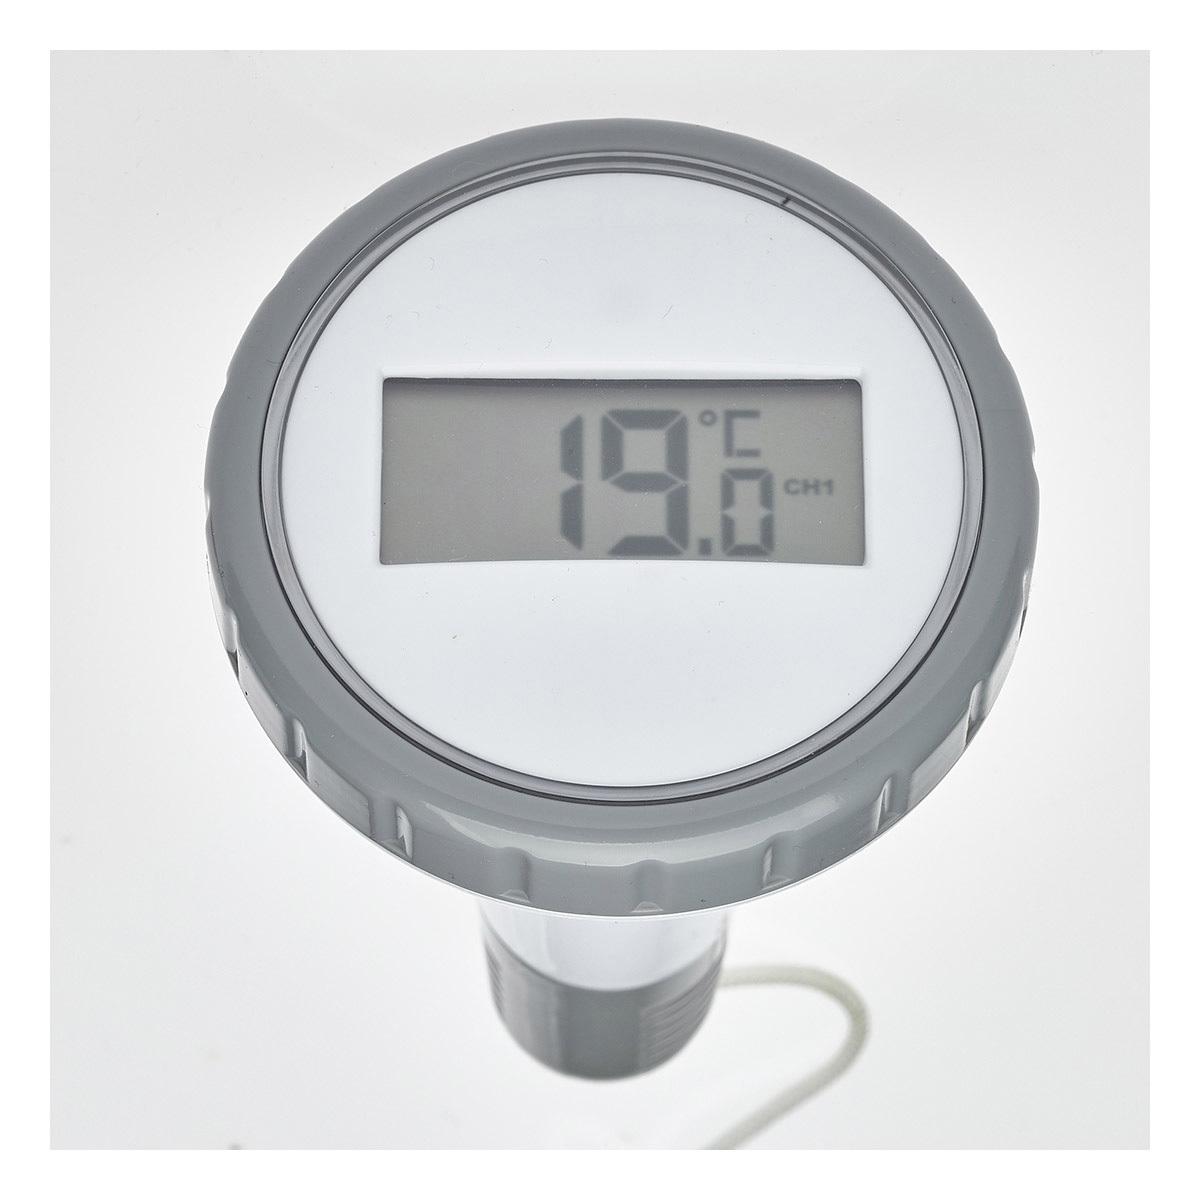 30-3067-10-funk-poolthermometer-palma-sender1-1200x1200px.jpg